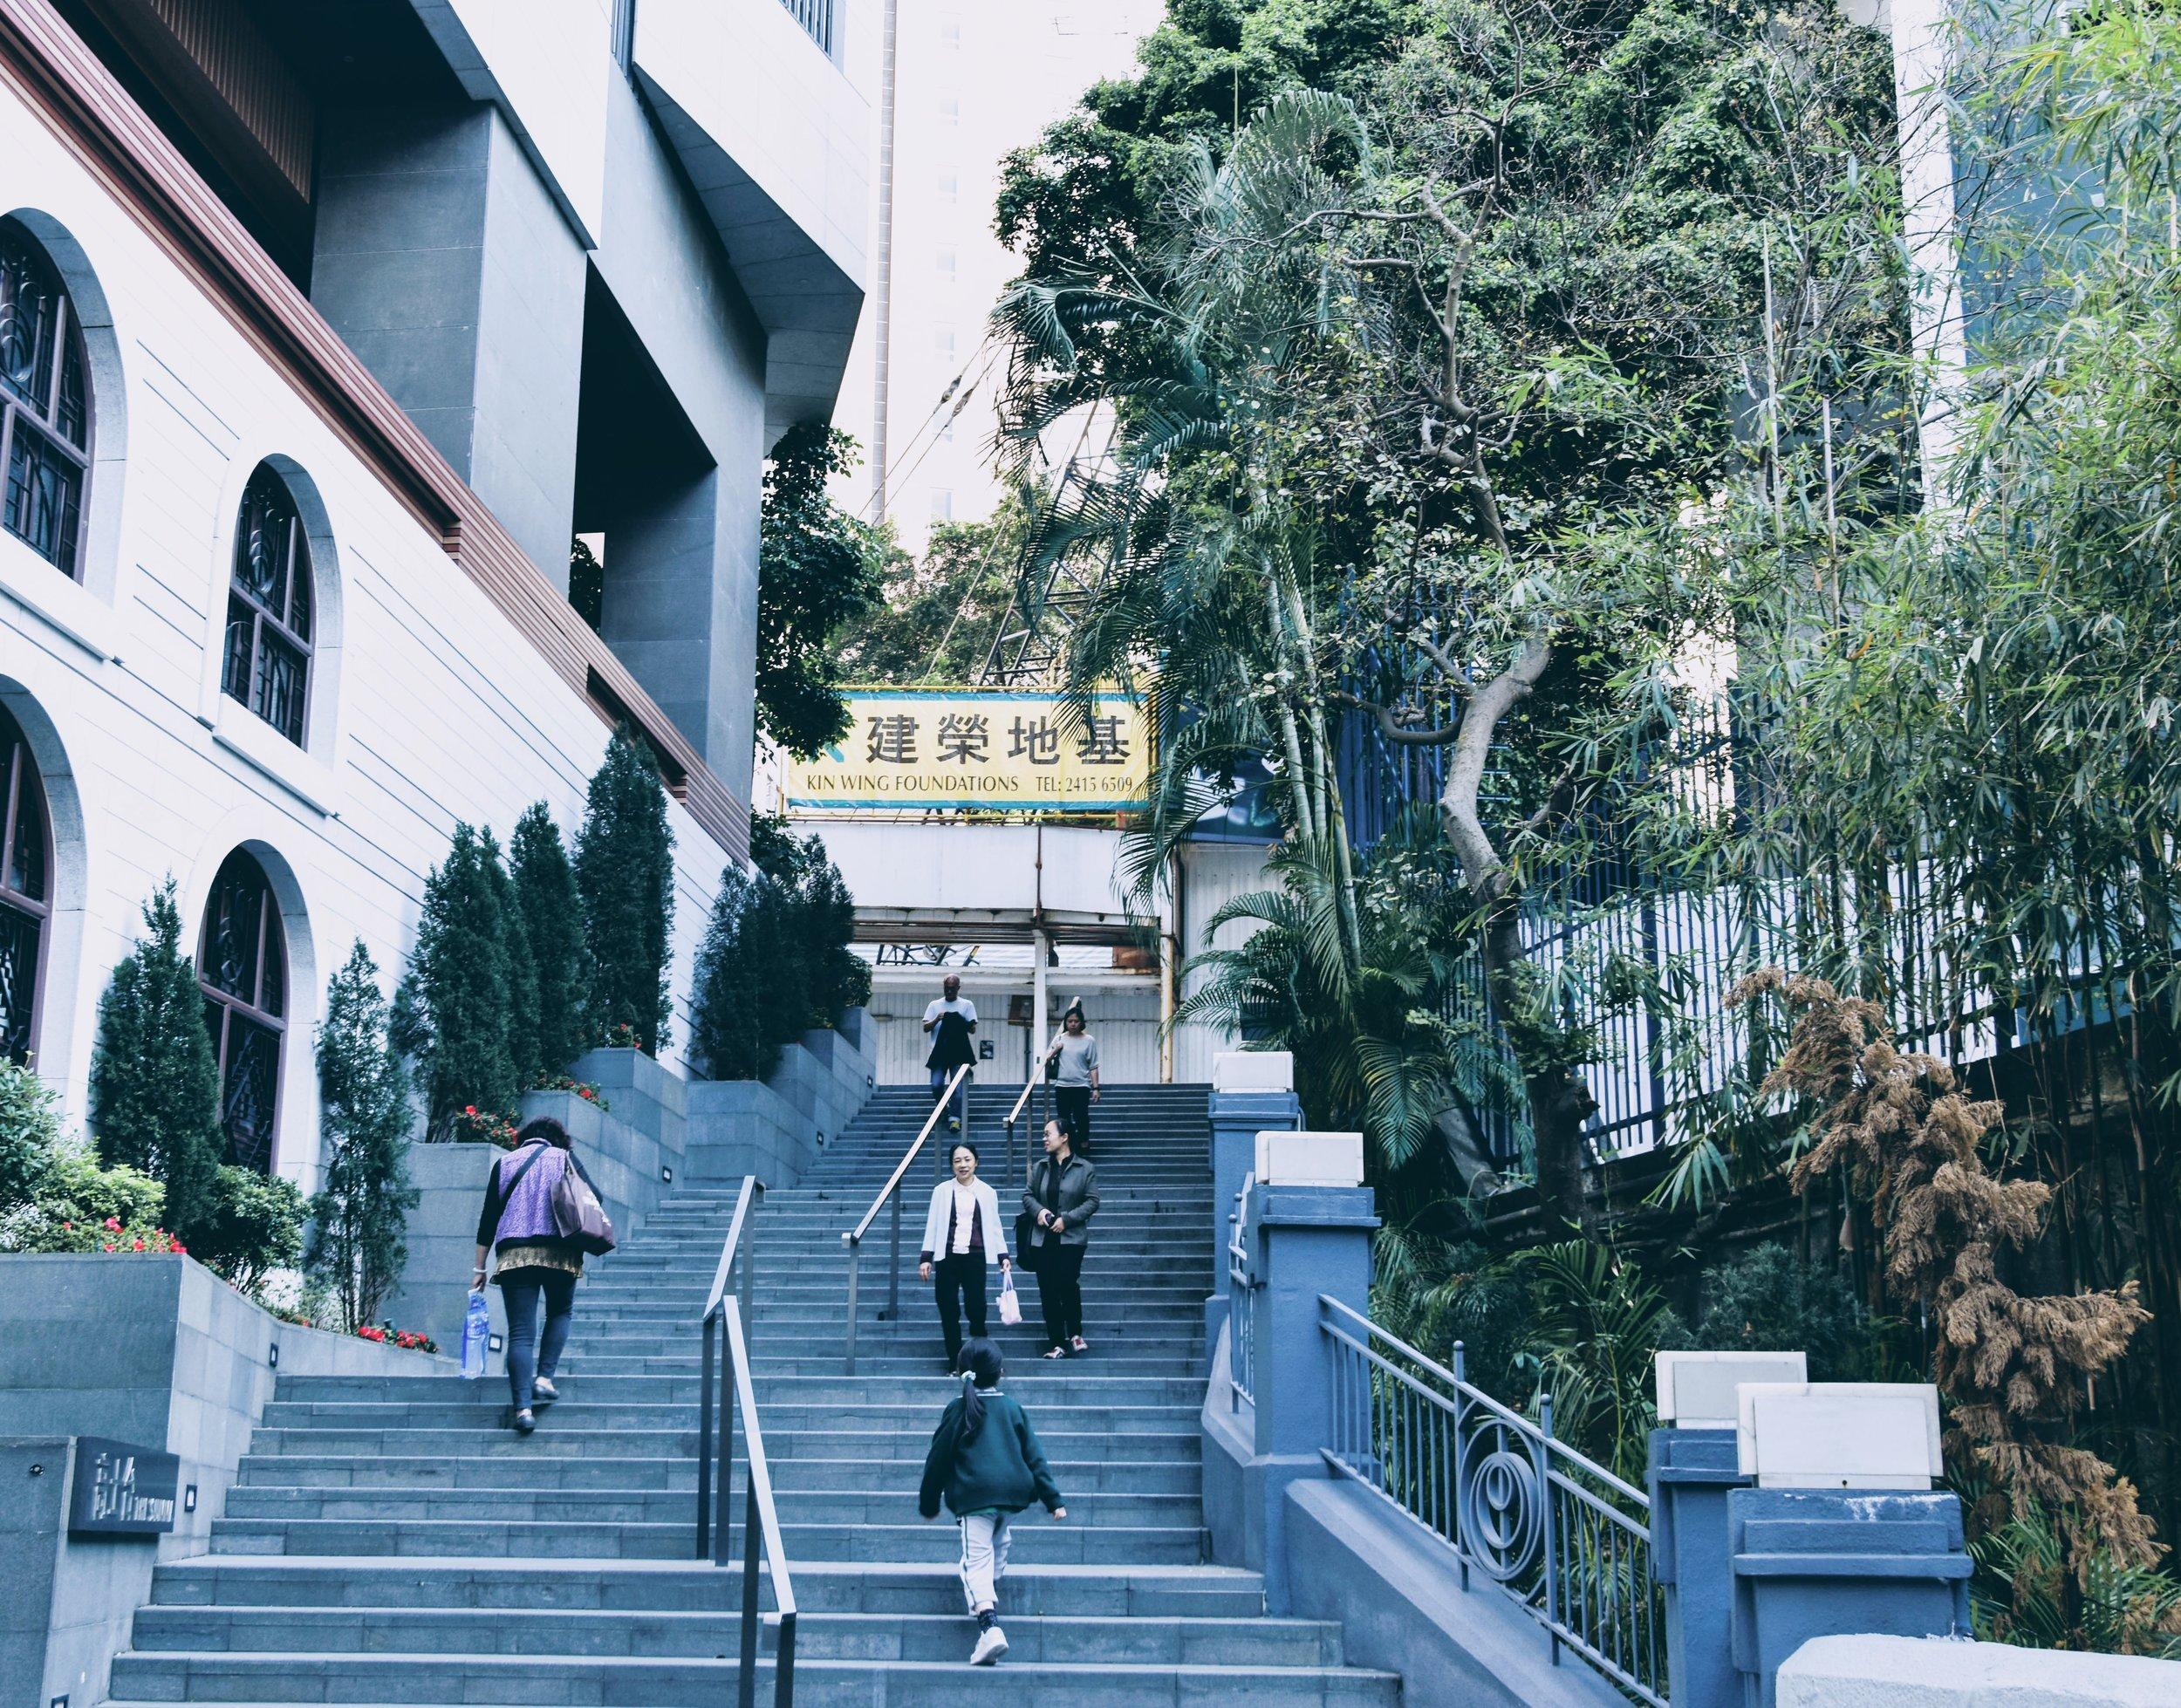 Neighborhoods: Sai Ying Pung, inside Hong Kong's hip and cool urban area